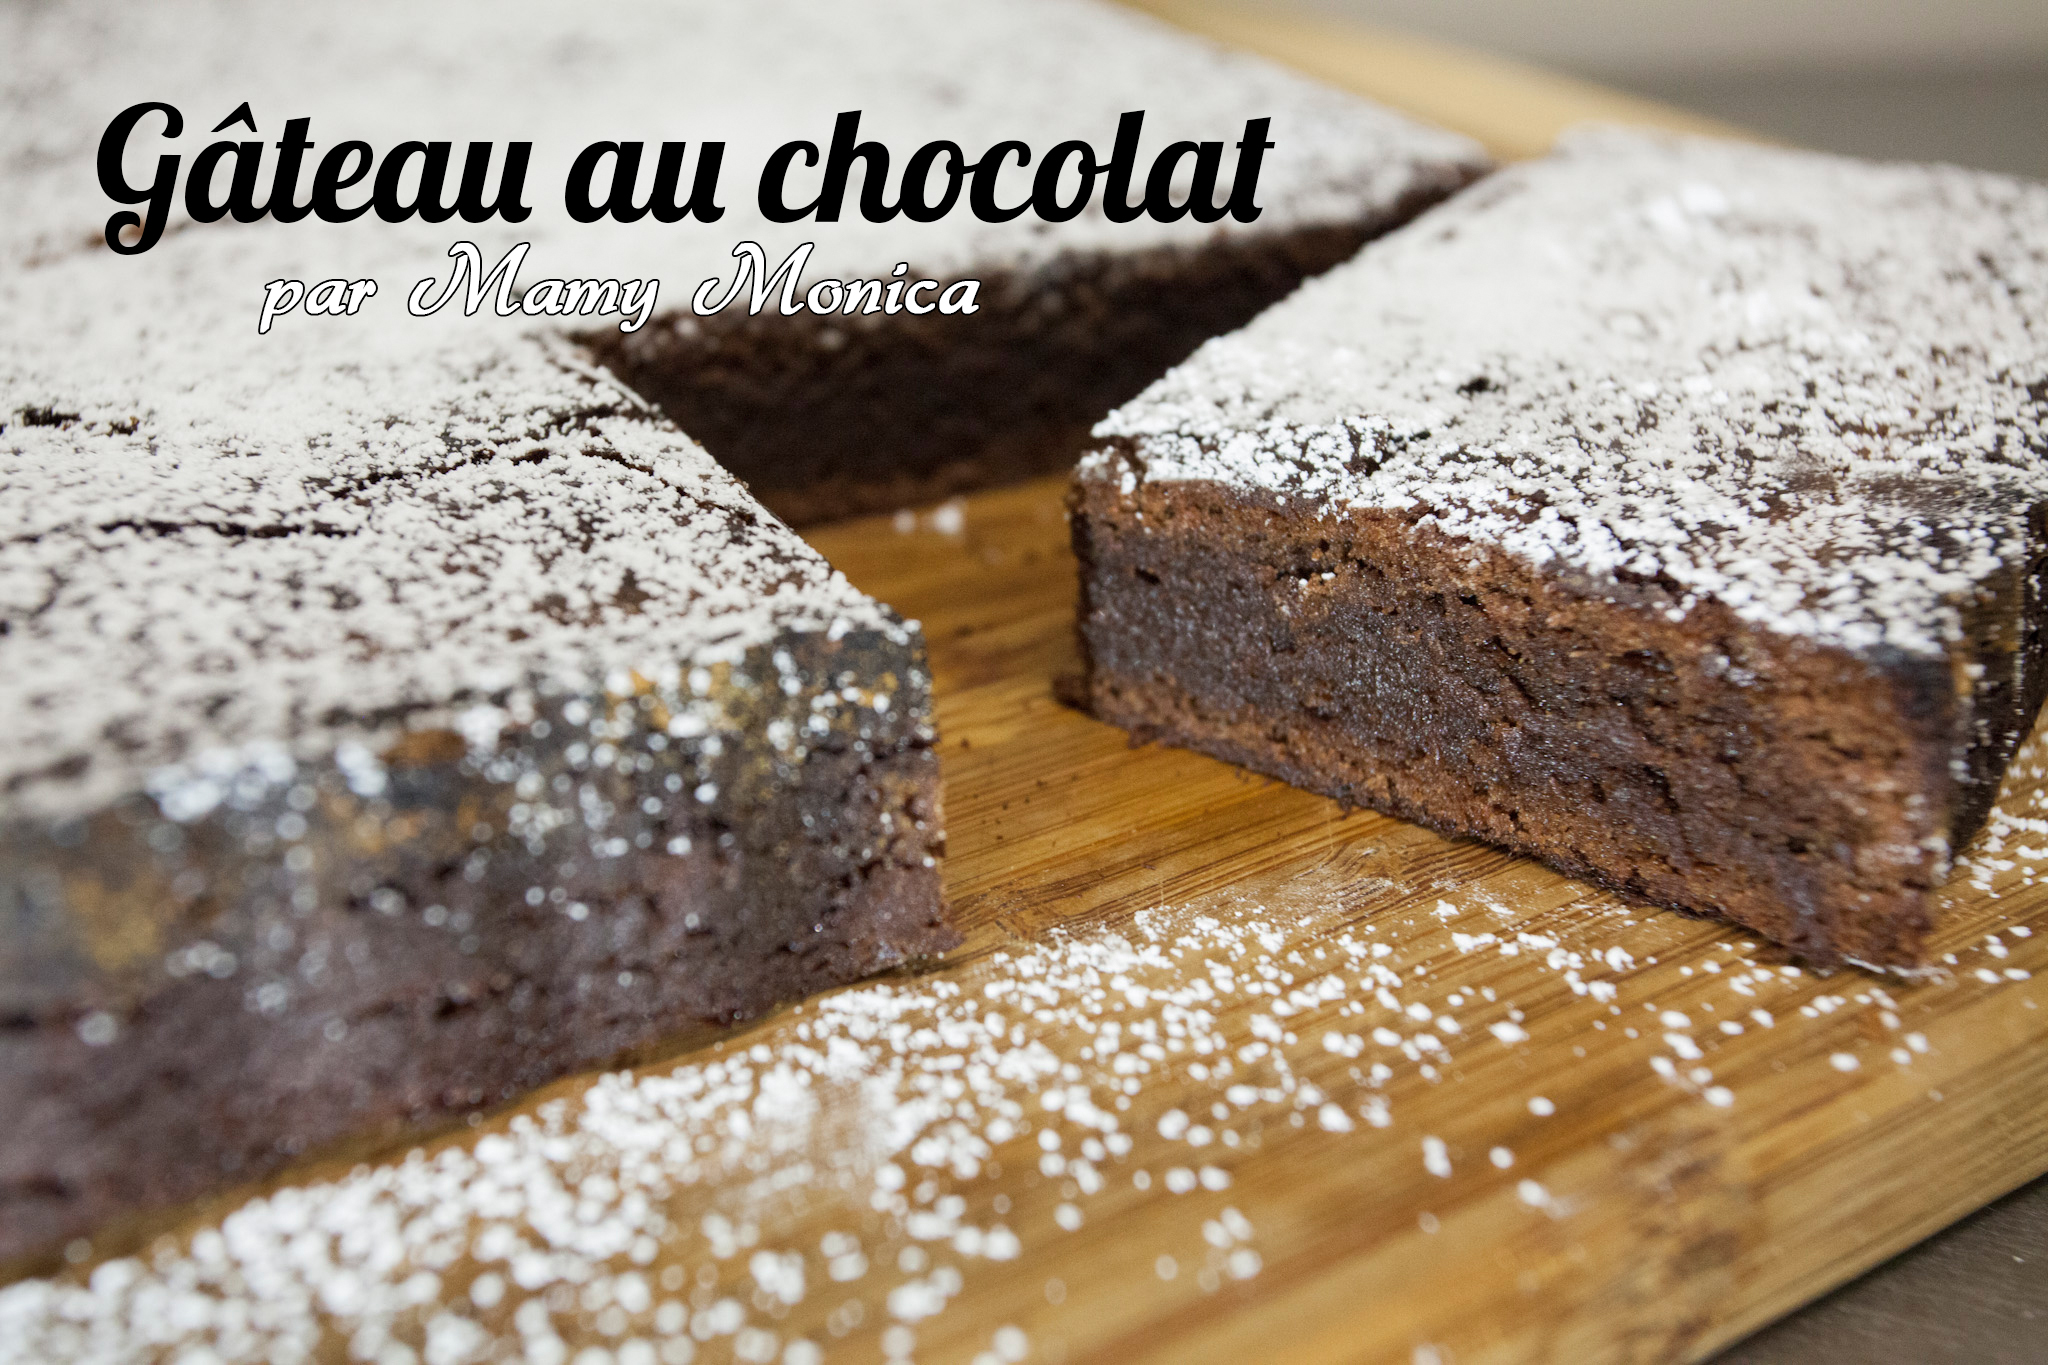 Recette Facile Du Gâteau Au Chocolat La Cuisine De Monica - La cuisine de monica